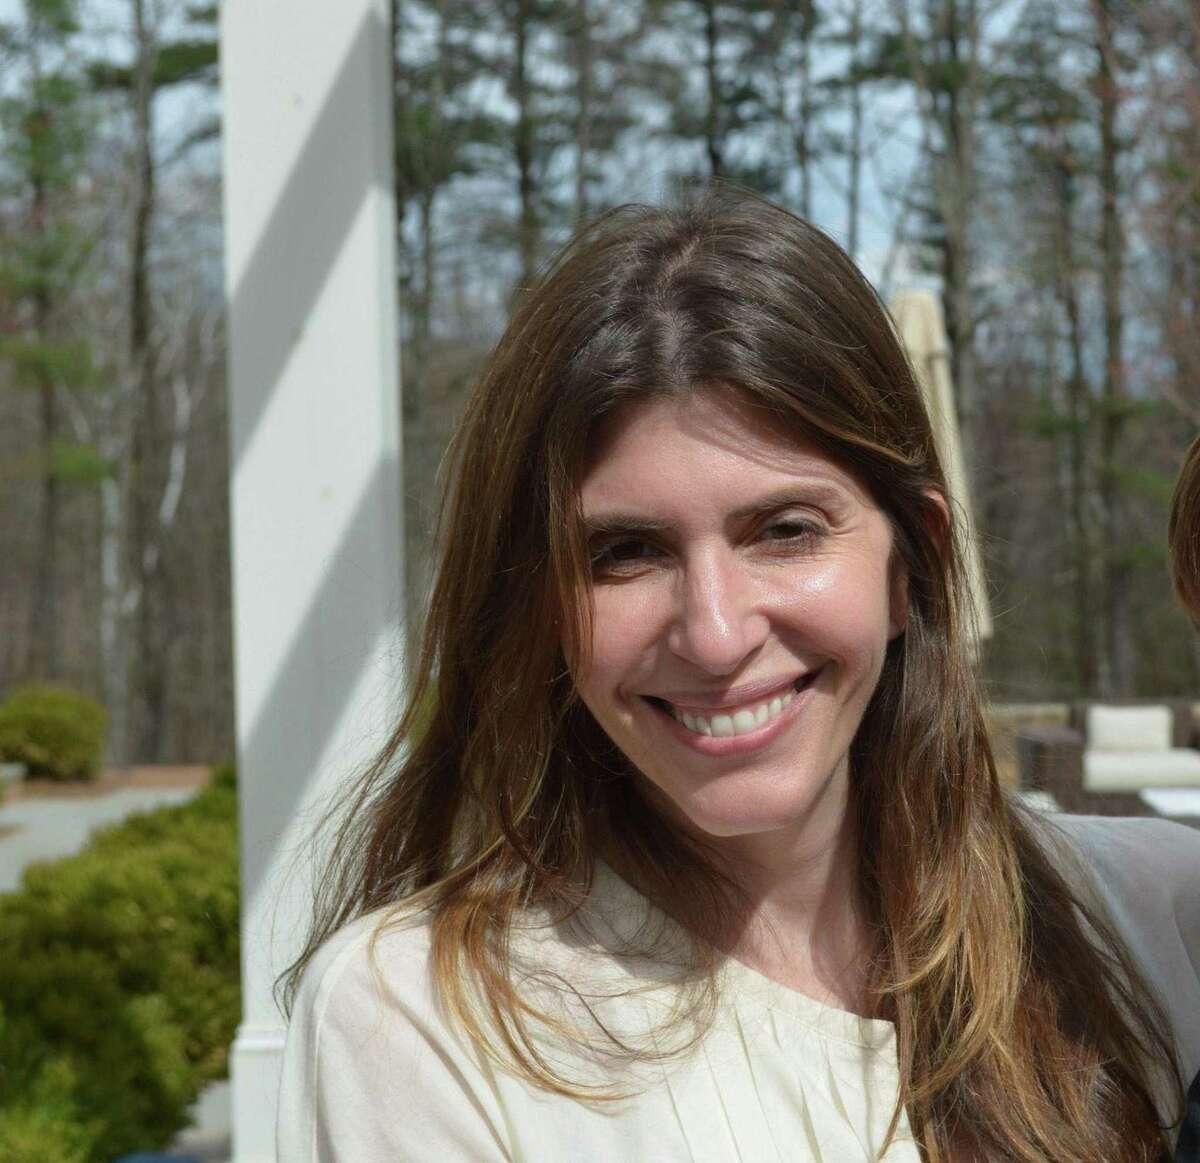 Jennifer Farber Dulos. (Handout/TNS)